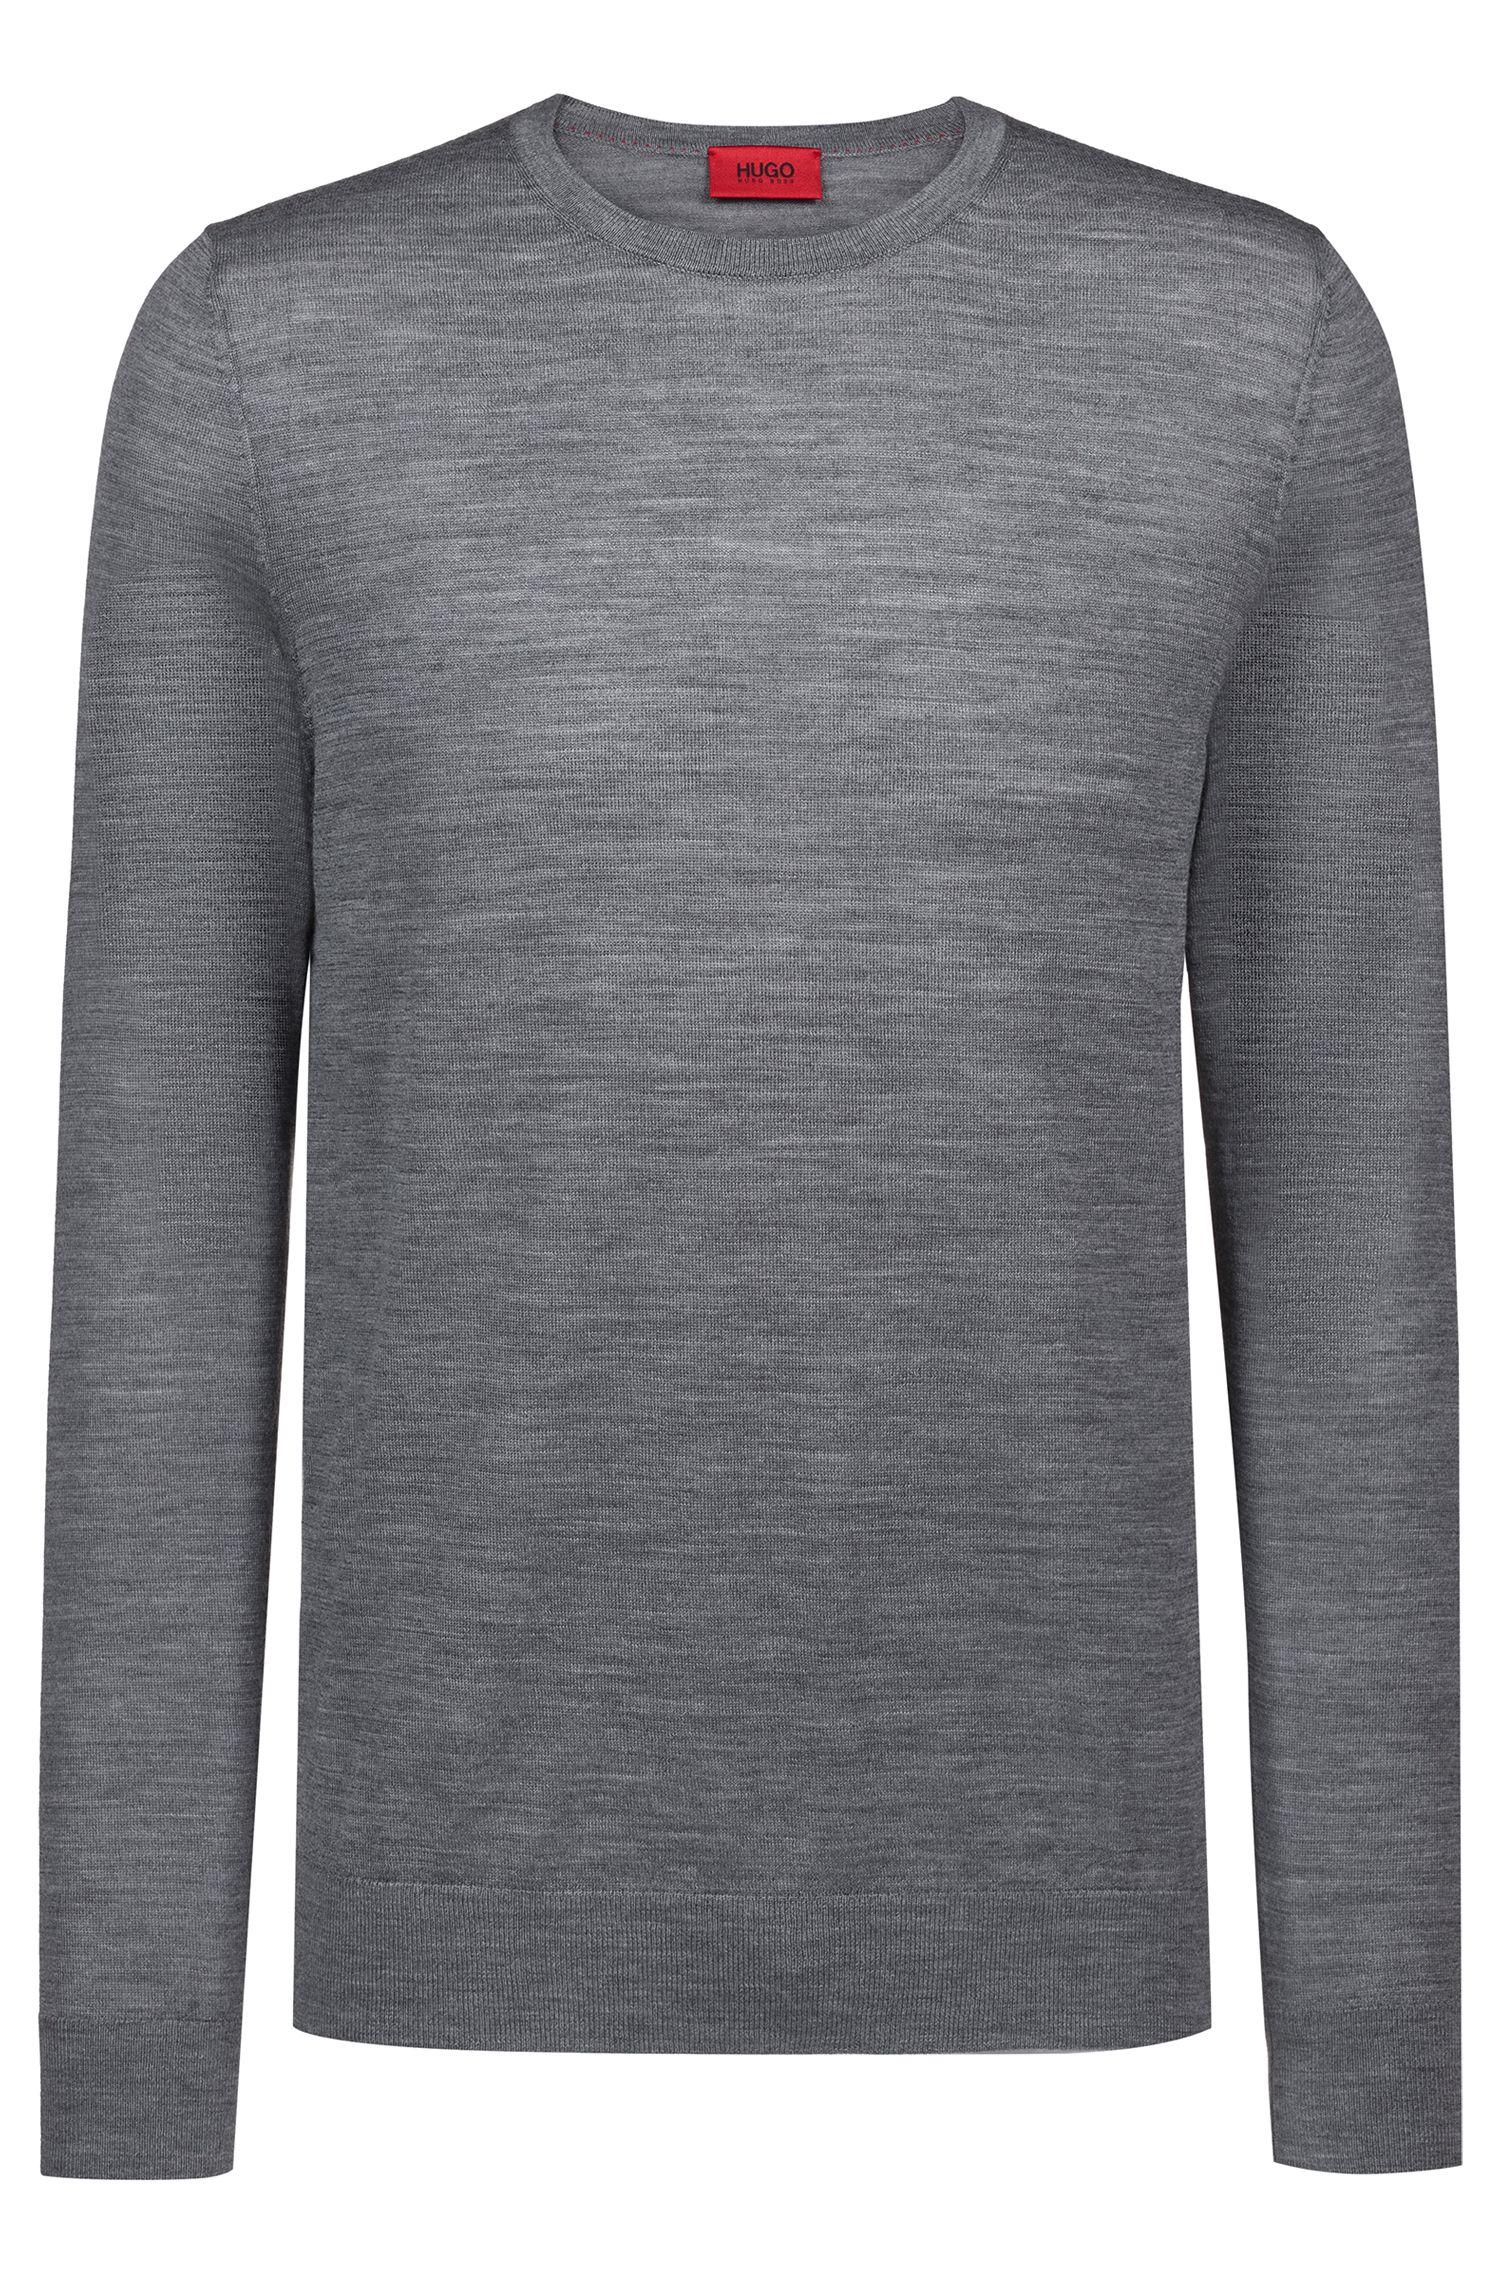 Crew-neck sweater in a lightweight merino wool blend, Grey